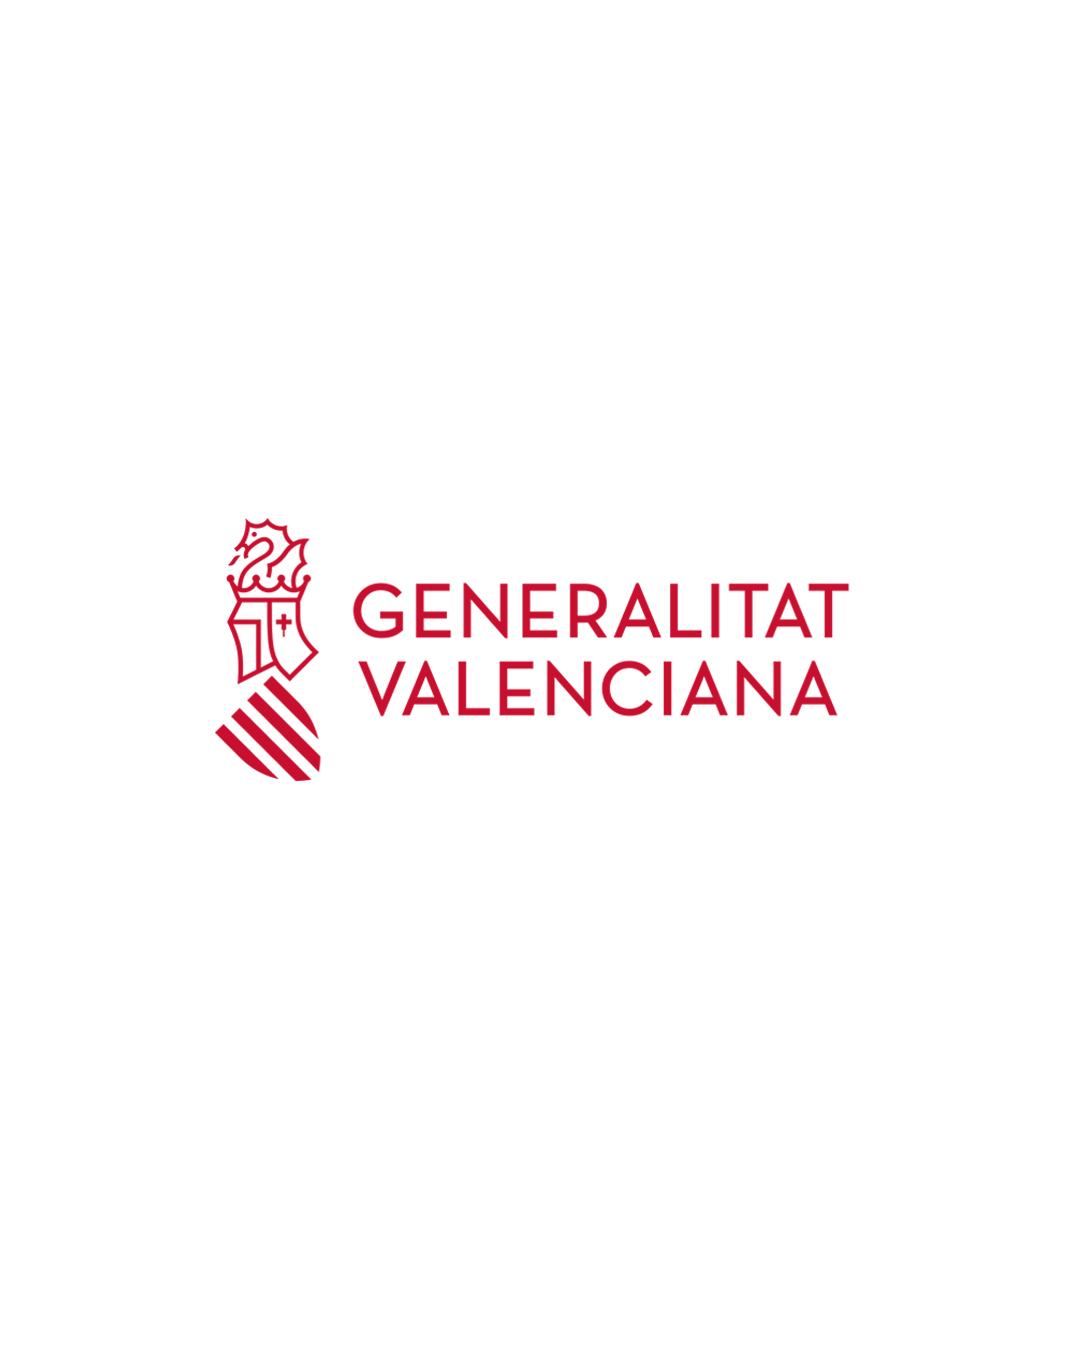 XGeneralitat Valenciana